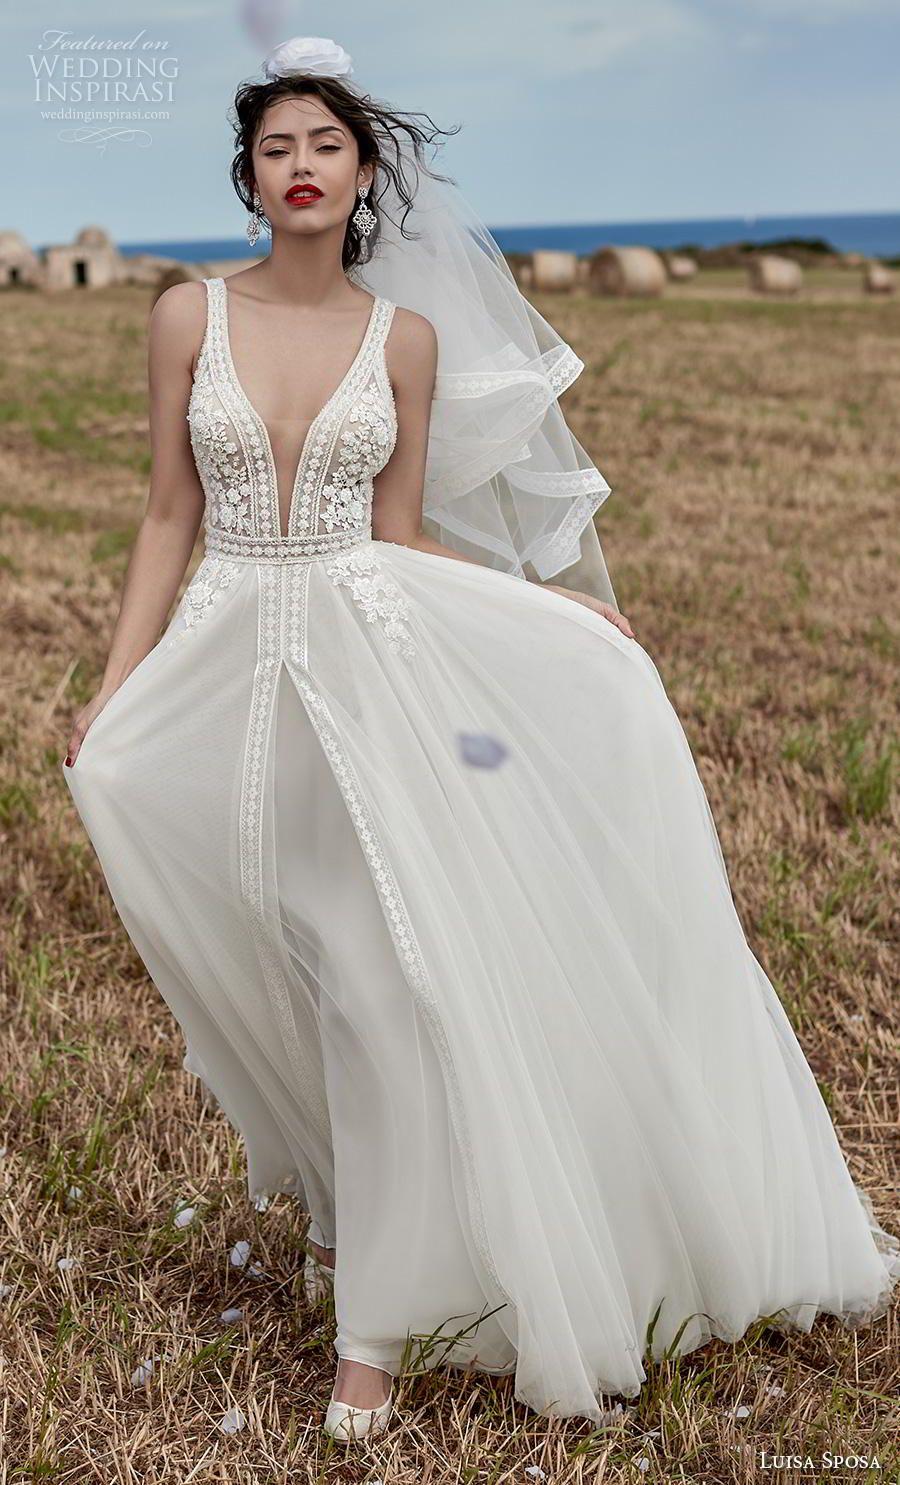 Abiti Da Sposa Luisa.Luisa Sposa 2020 Wedding Dresses Matrimonio Sulla Spiaggia